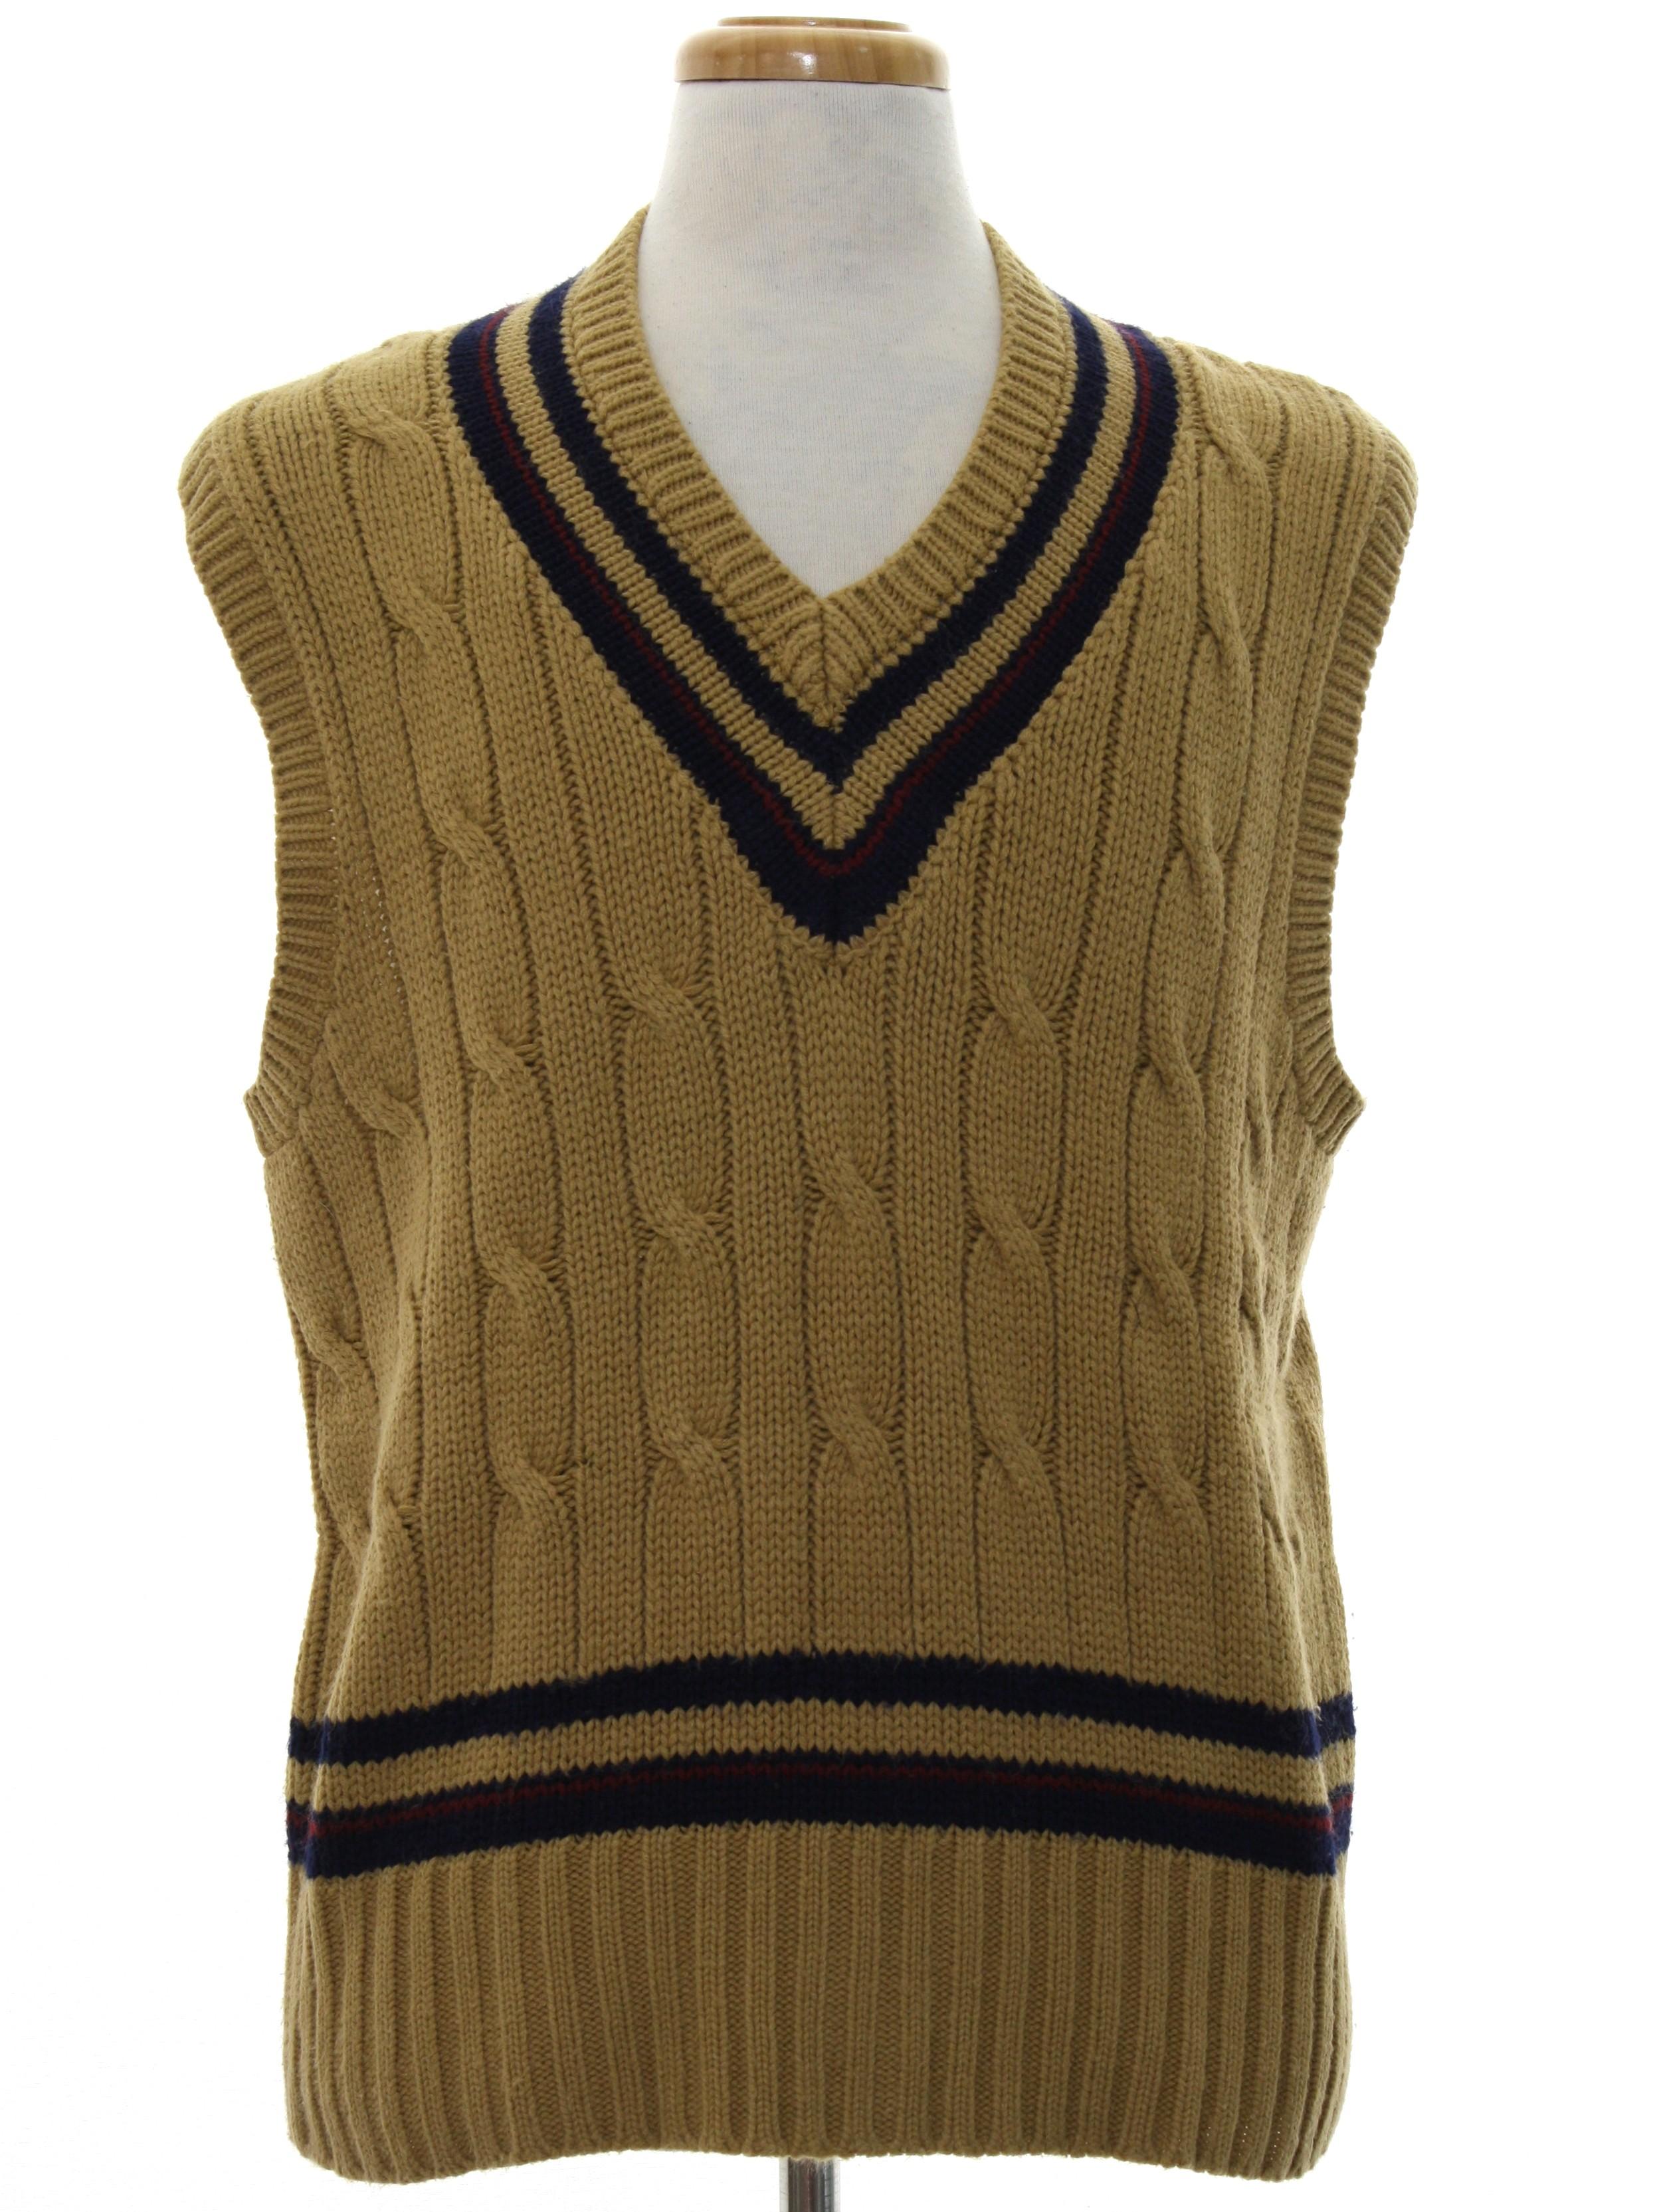 80s Sweater (Stephen Douglas by Forum): 80s -Stephen Douglas by ...